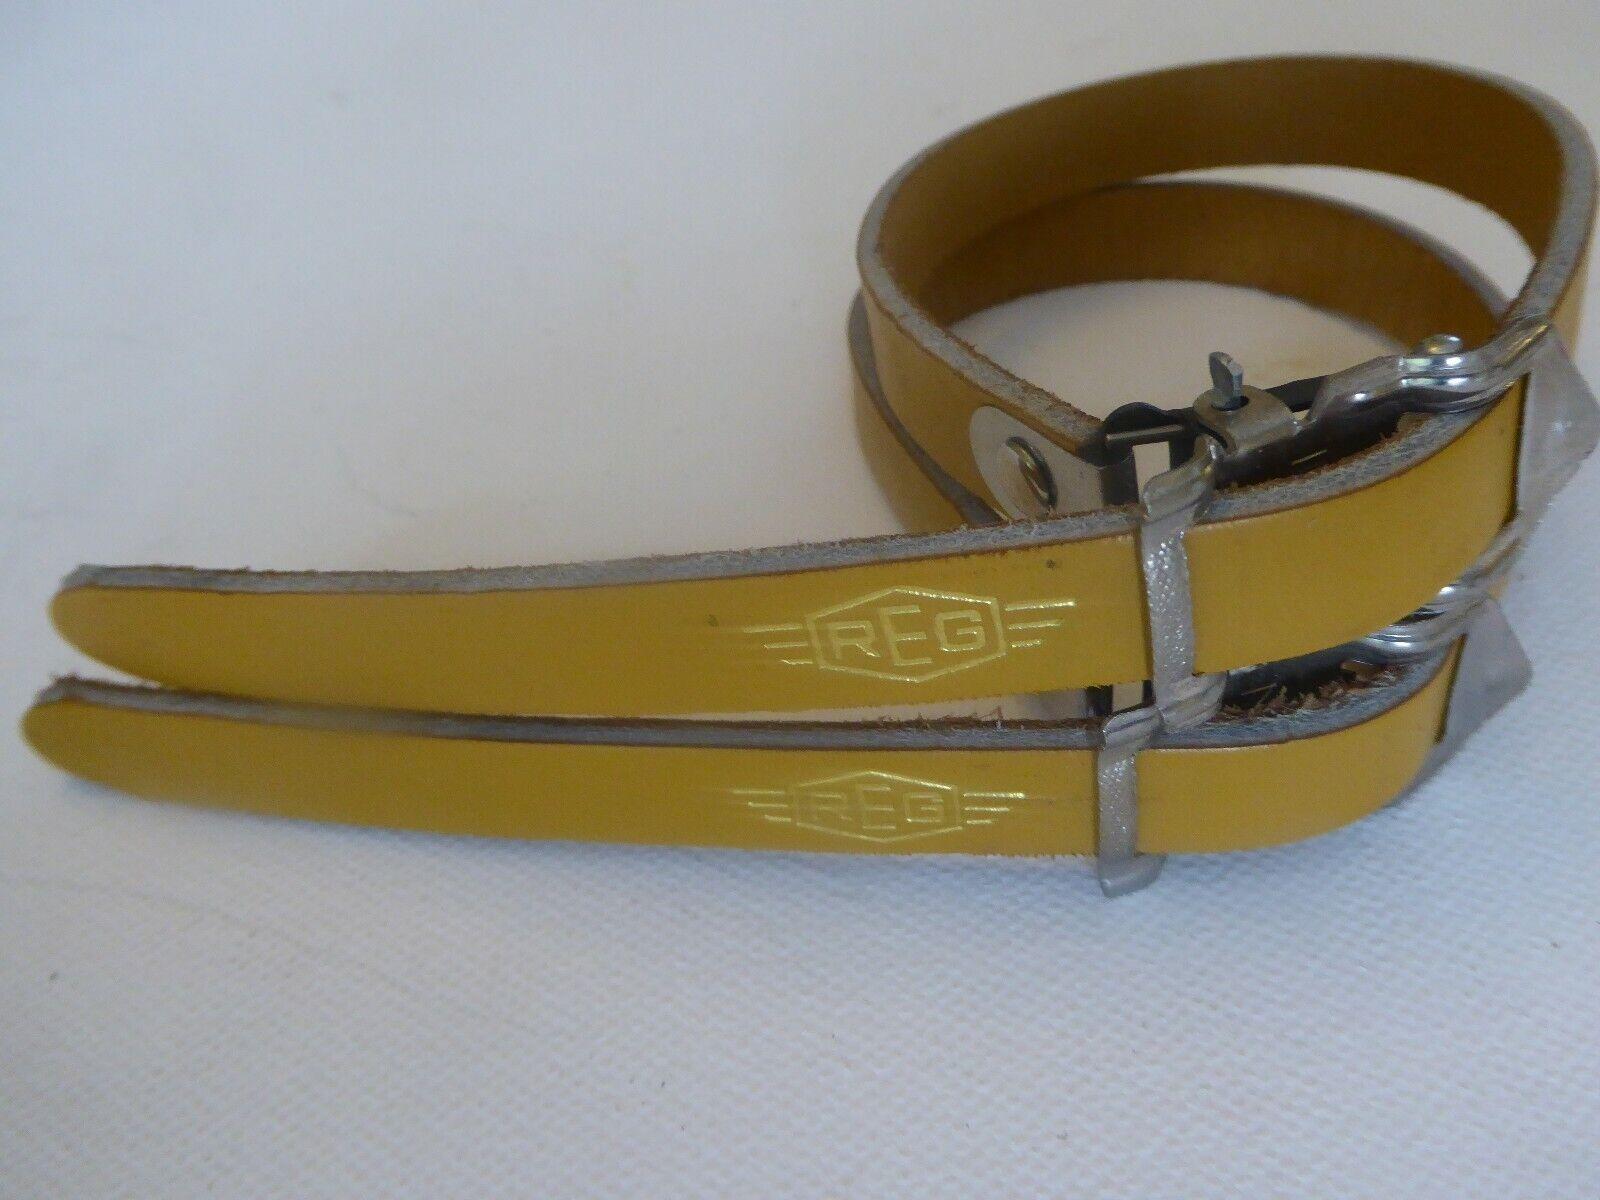 VINTAGE NOS REG Giallo Pelle Italiana PEDALE cinghie per il tuo Vintage Ride